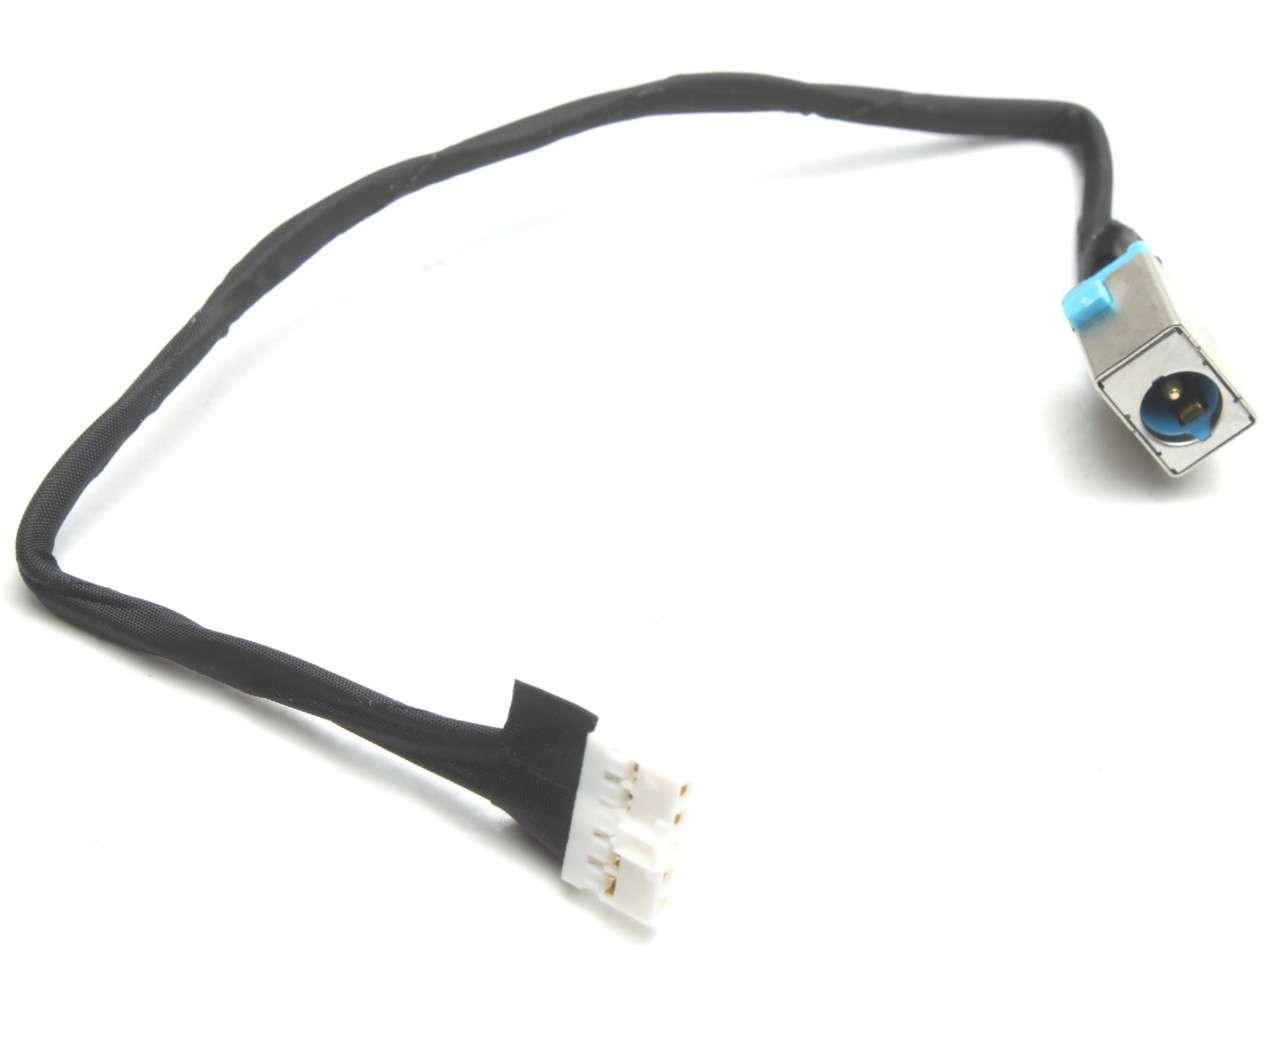 Mufa alimentare laptop Acer Aspire V5 591 cu fir imagine